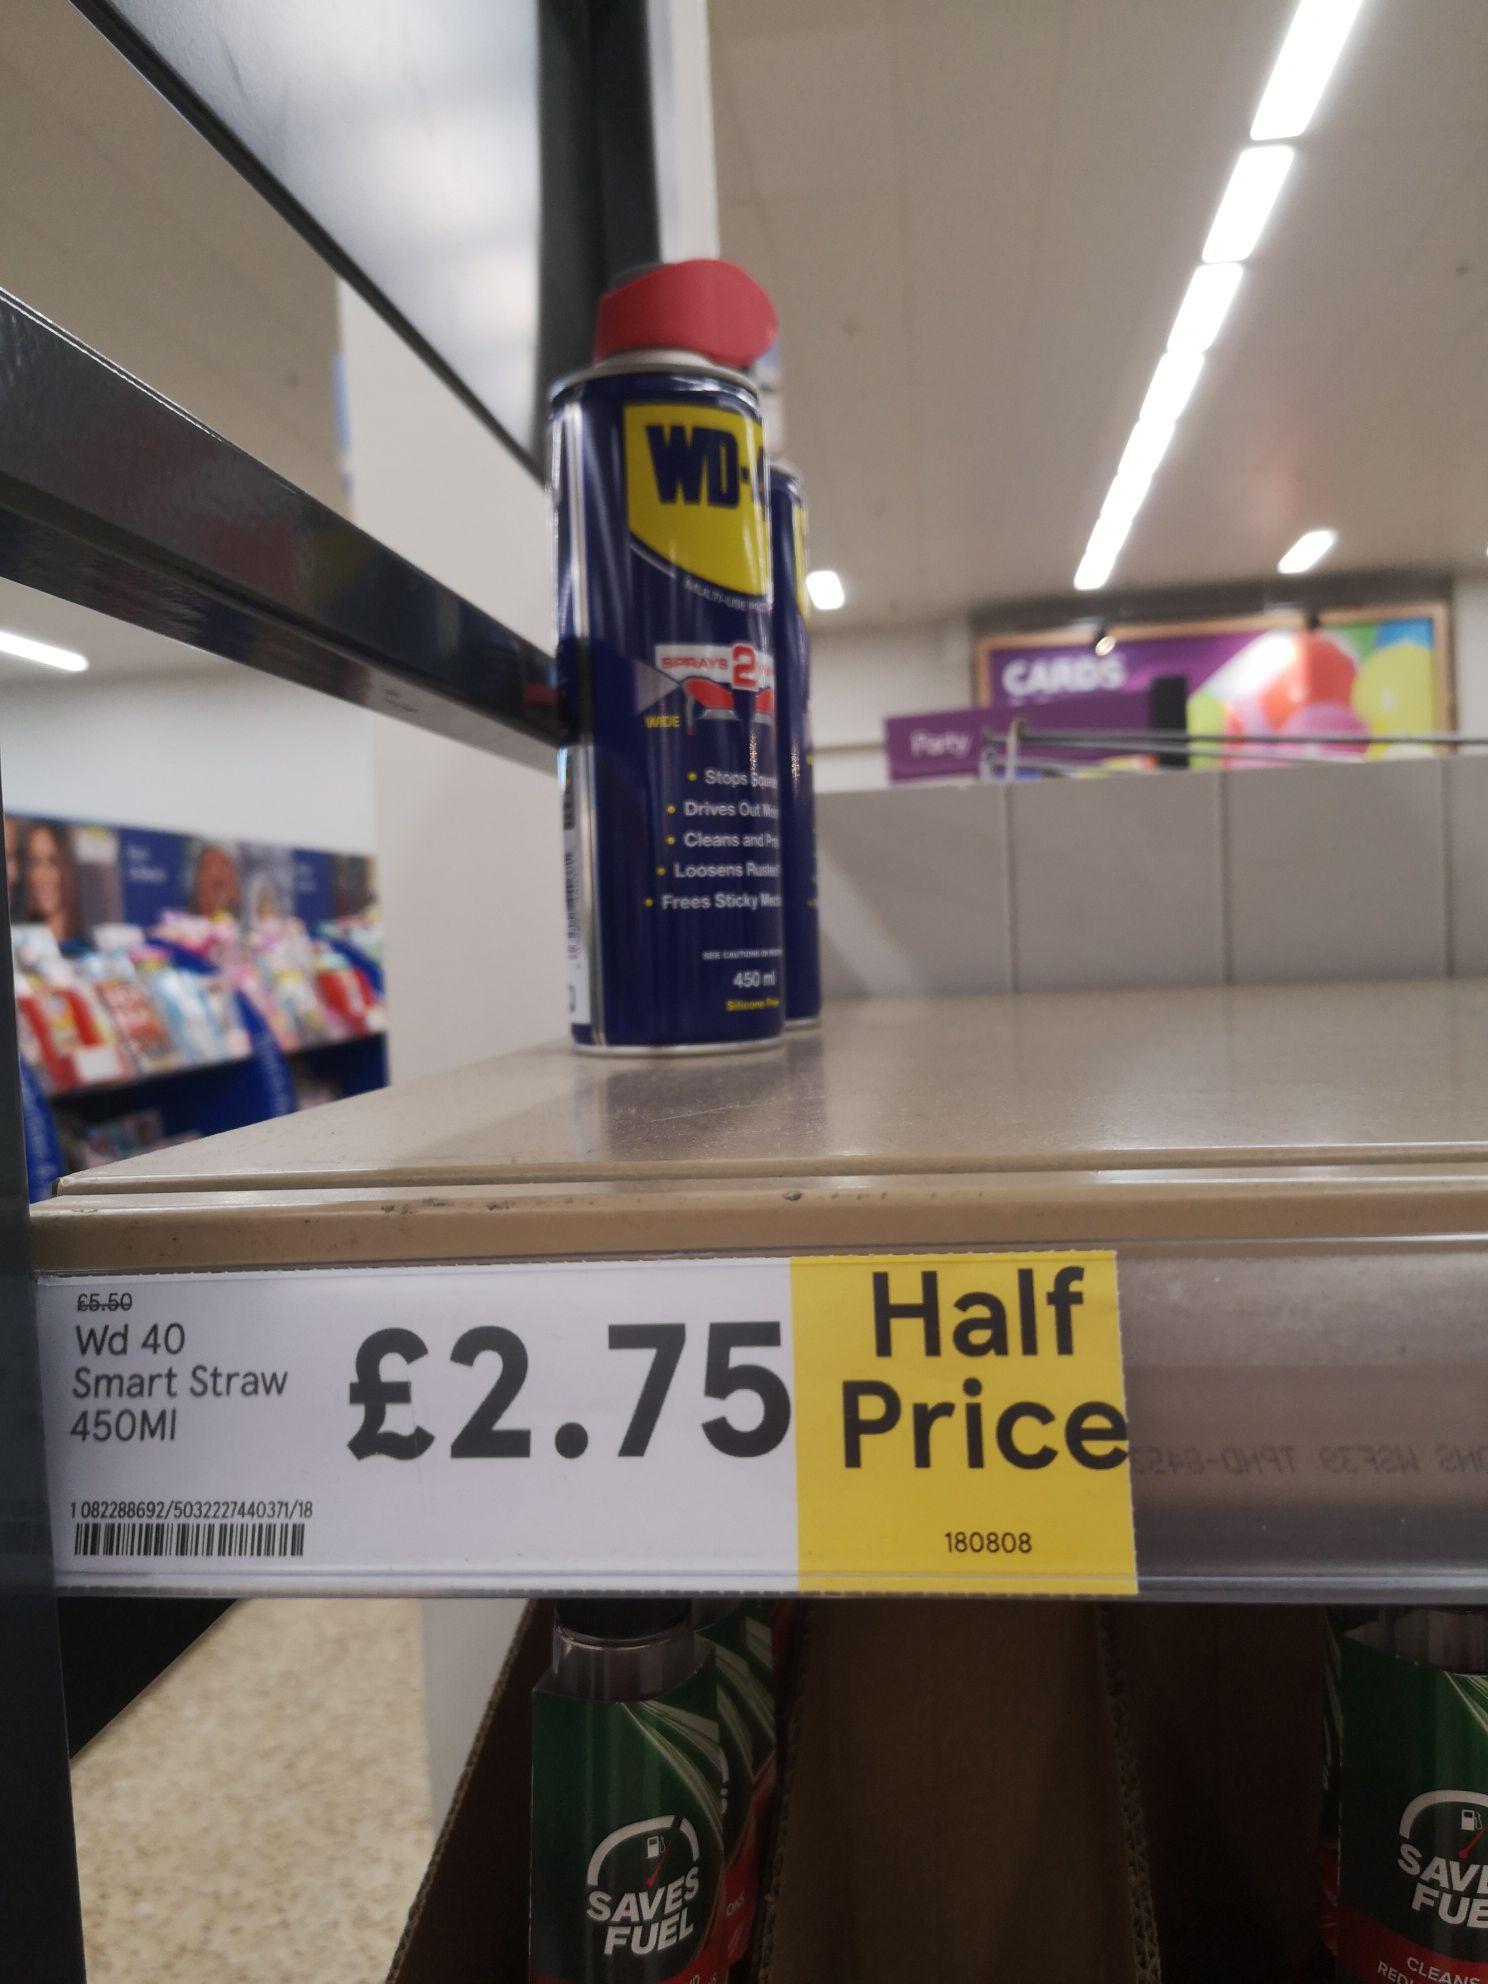 Wd40 spray 450ml - £2.75 instore @ Tesco